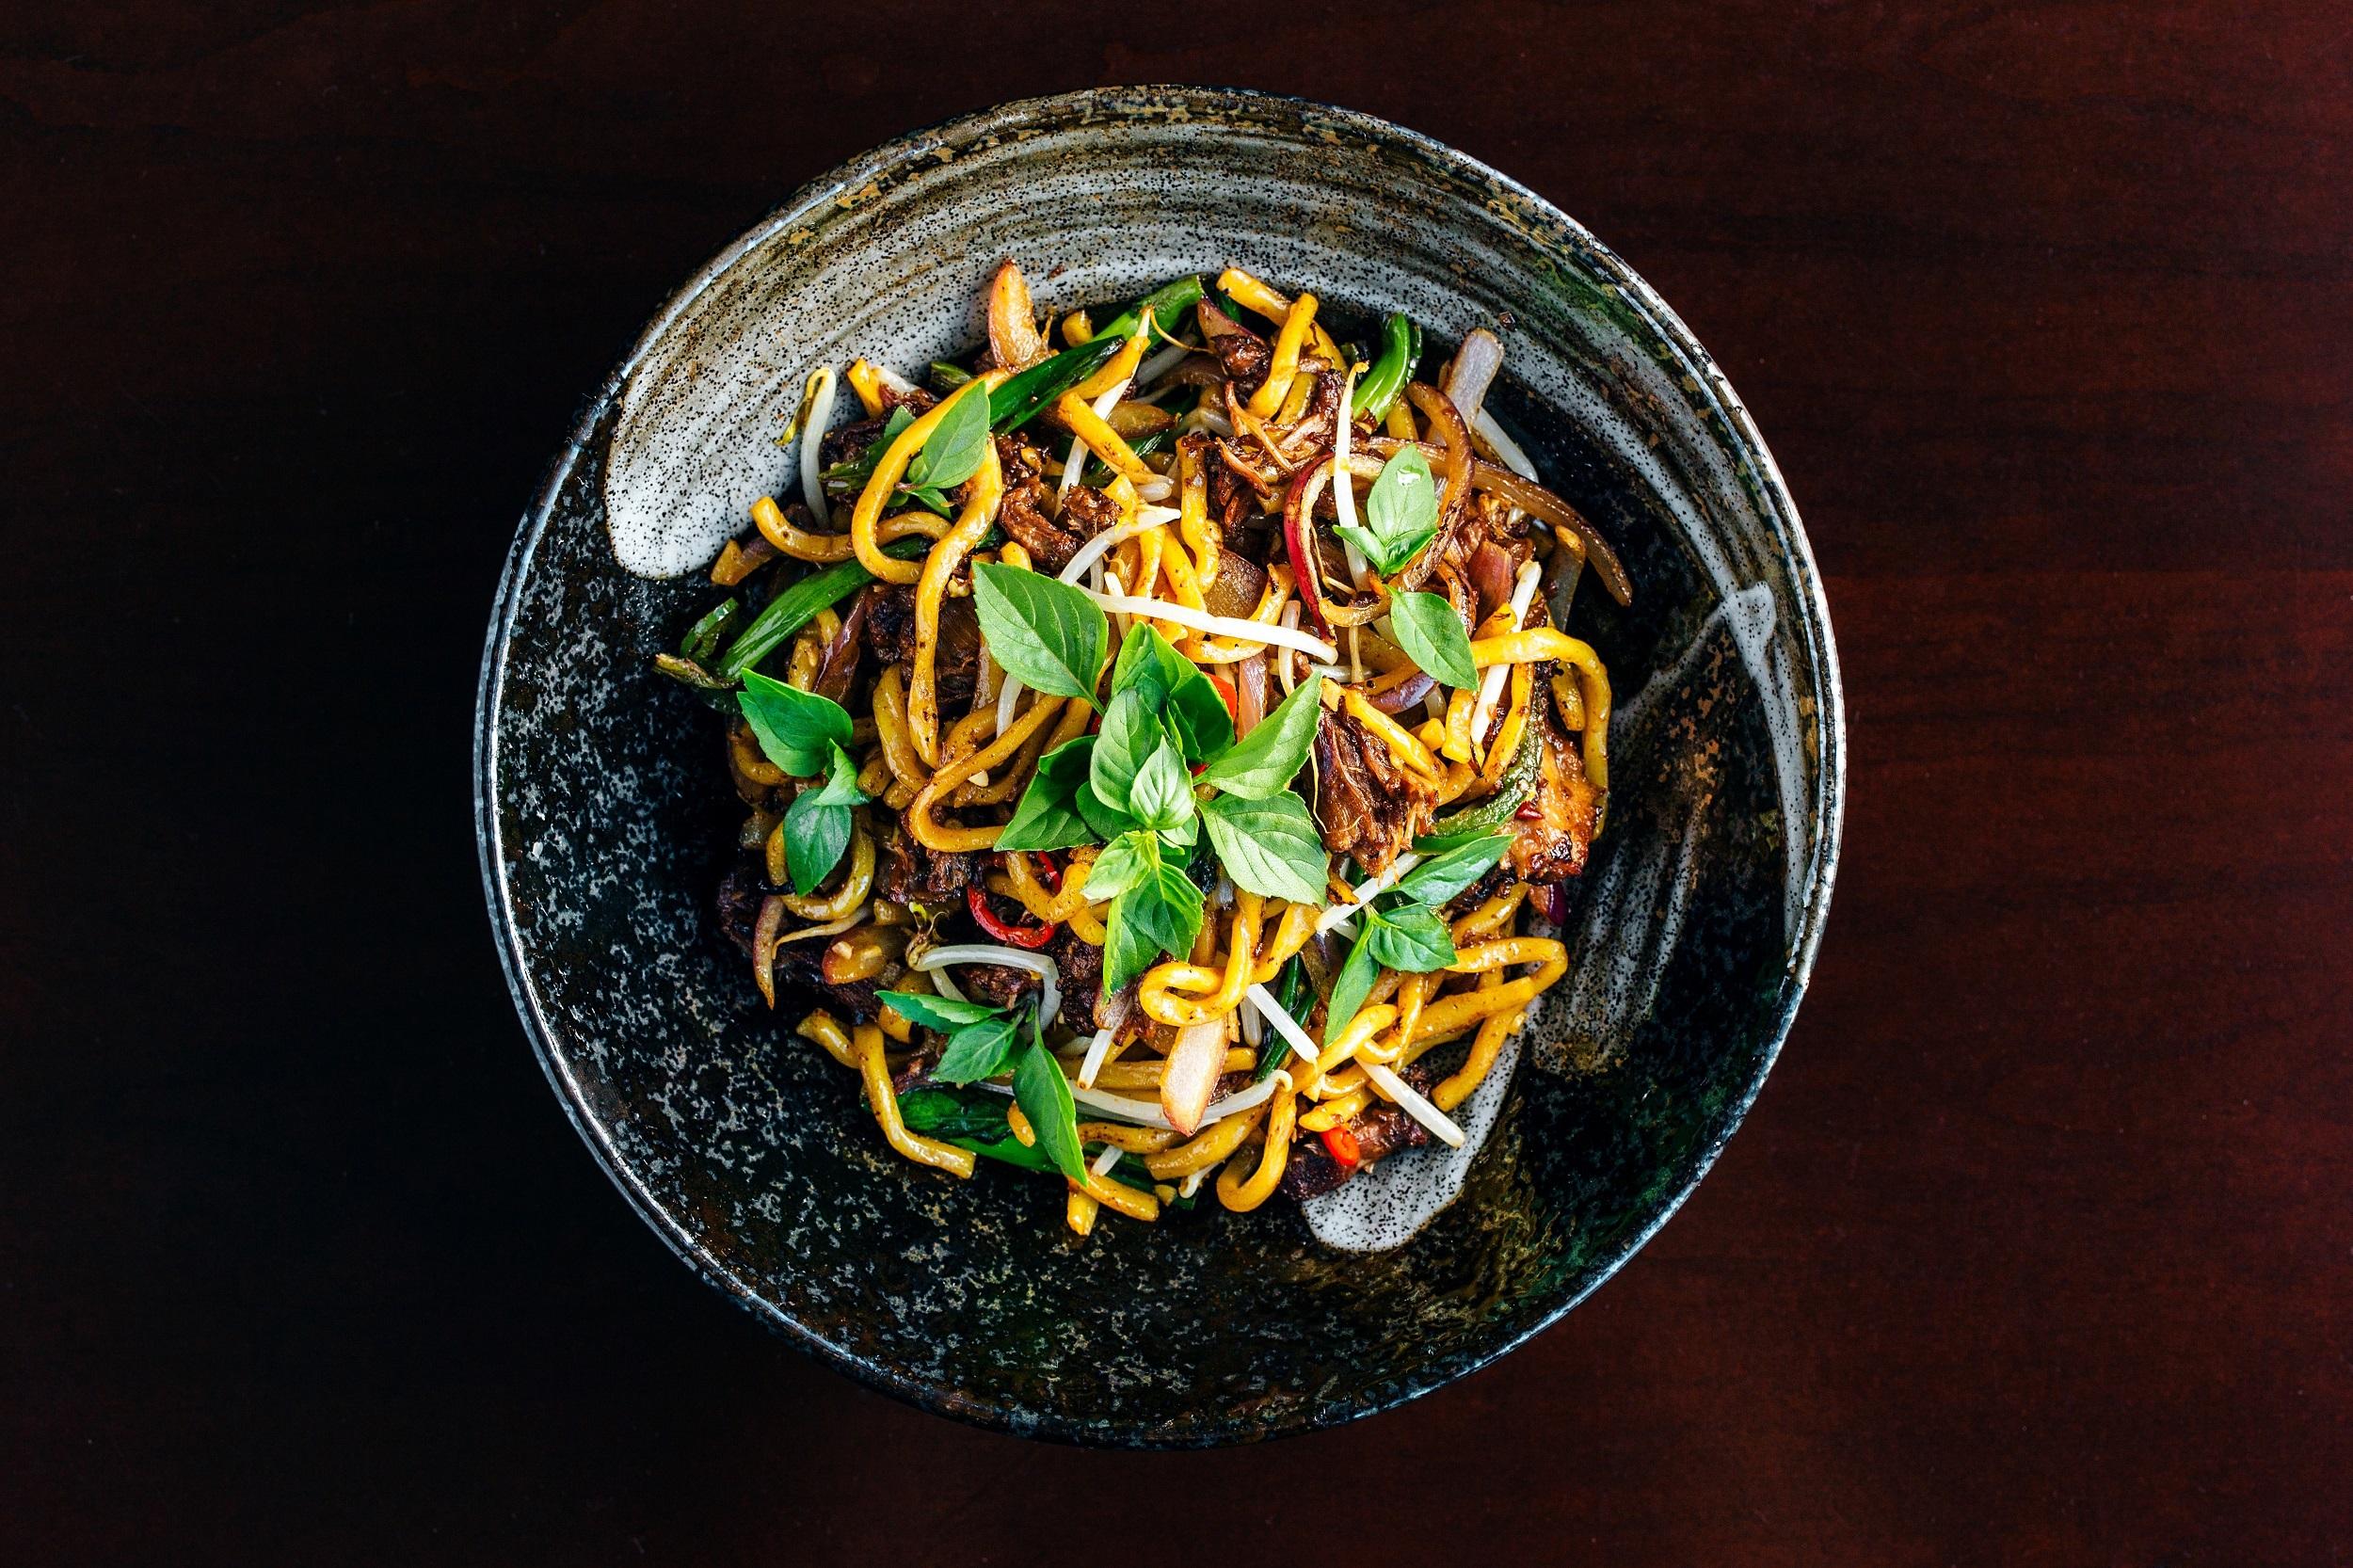 Noodles lo